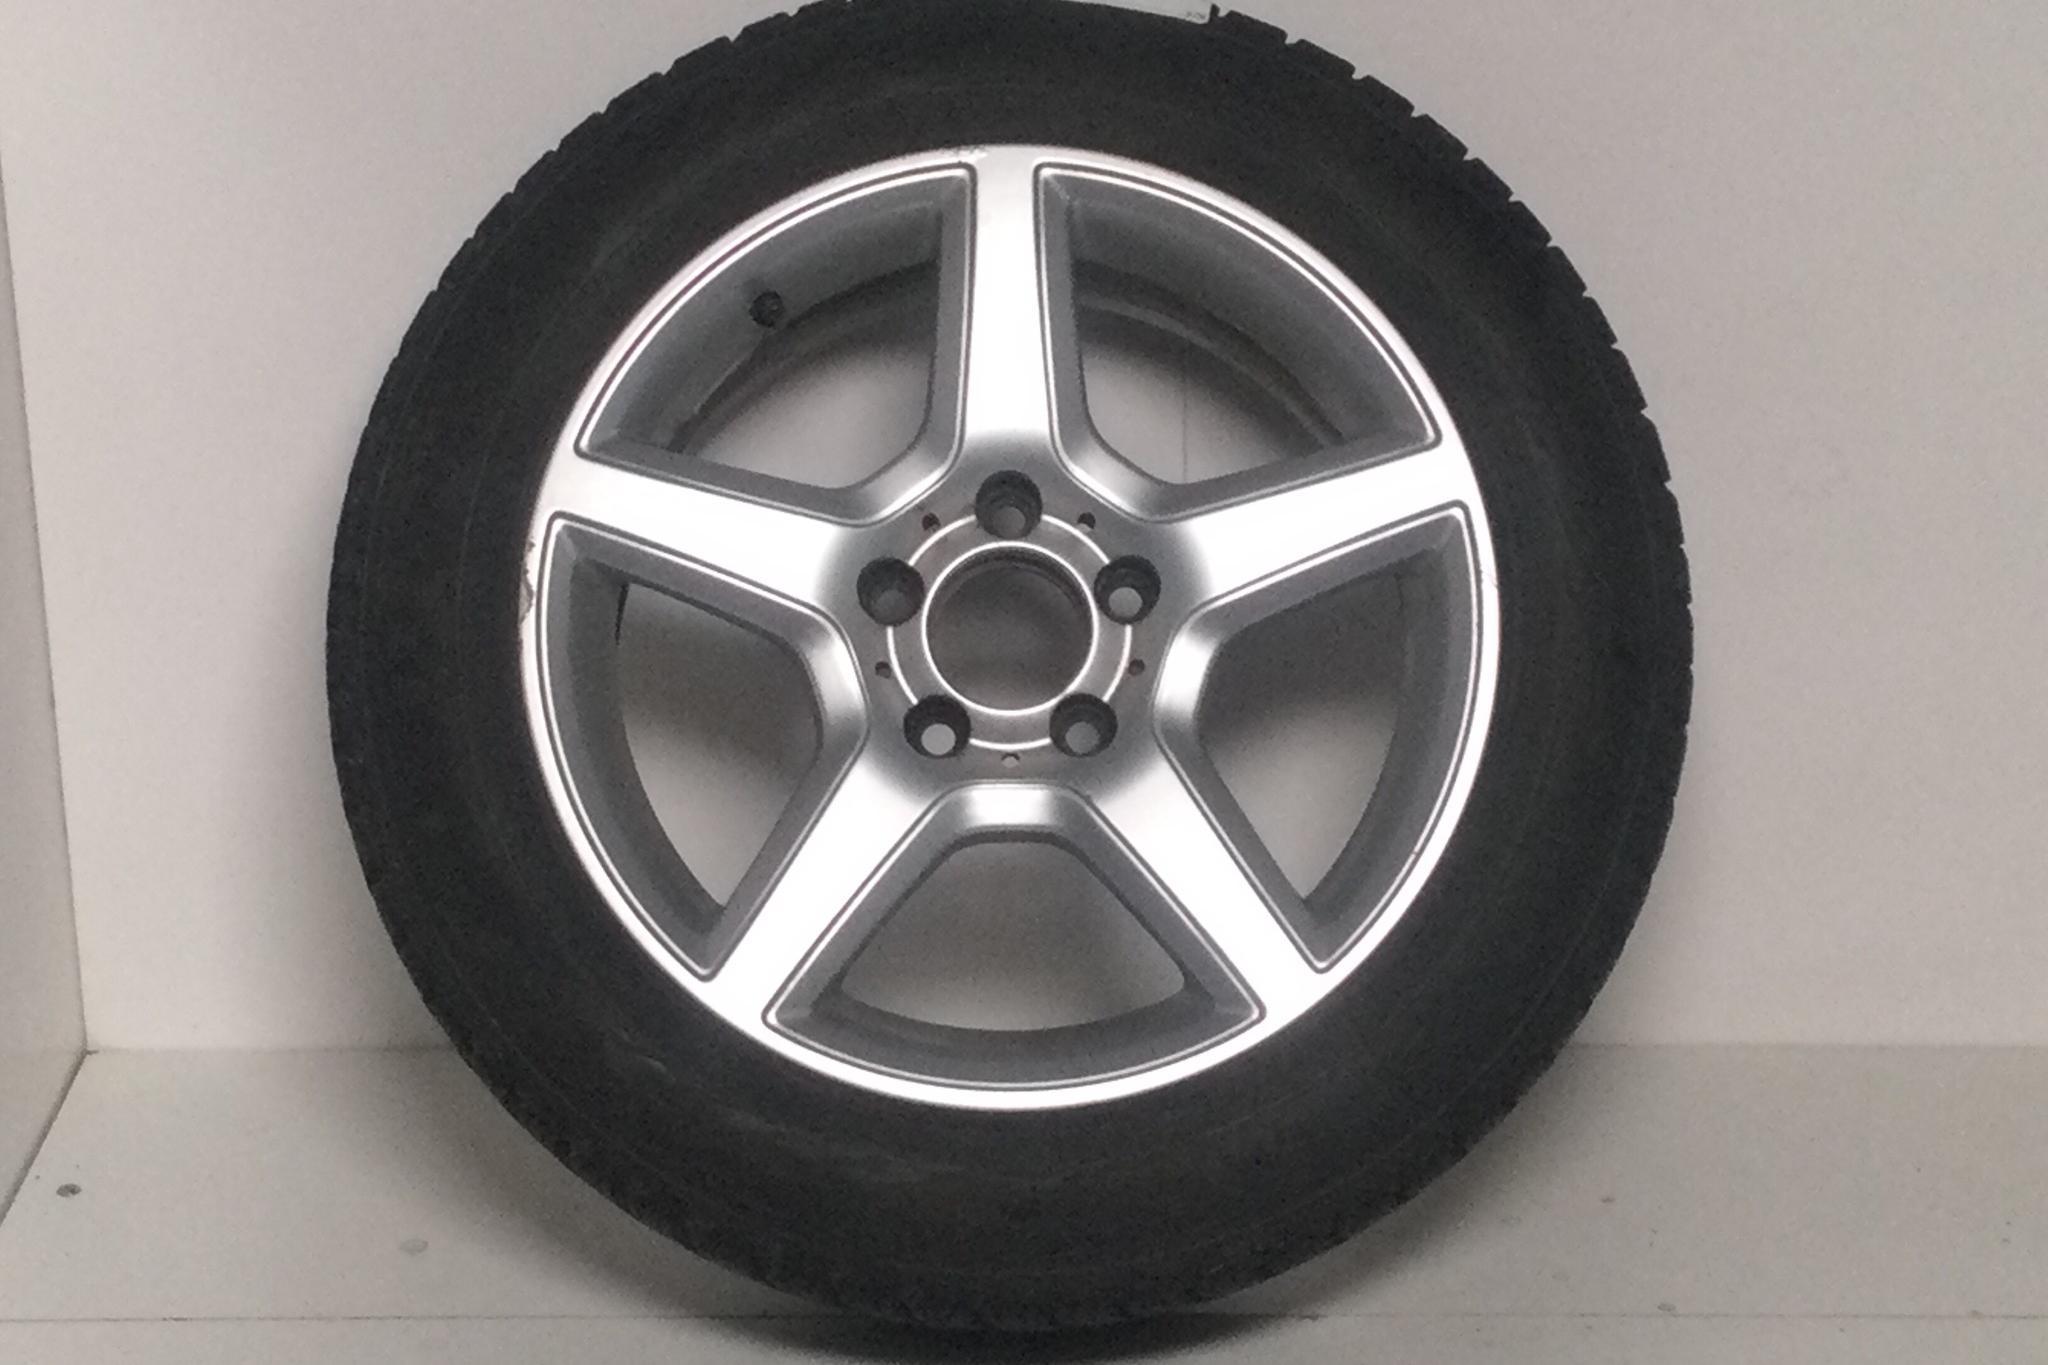 Mercedes C 220 CDI BlueEfficiency Kombi S204 (170hk) - 244 270 km - Automatic - Dark Grey - 2011